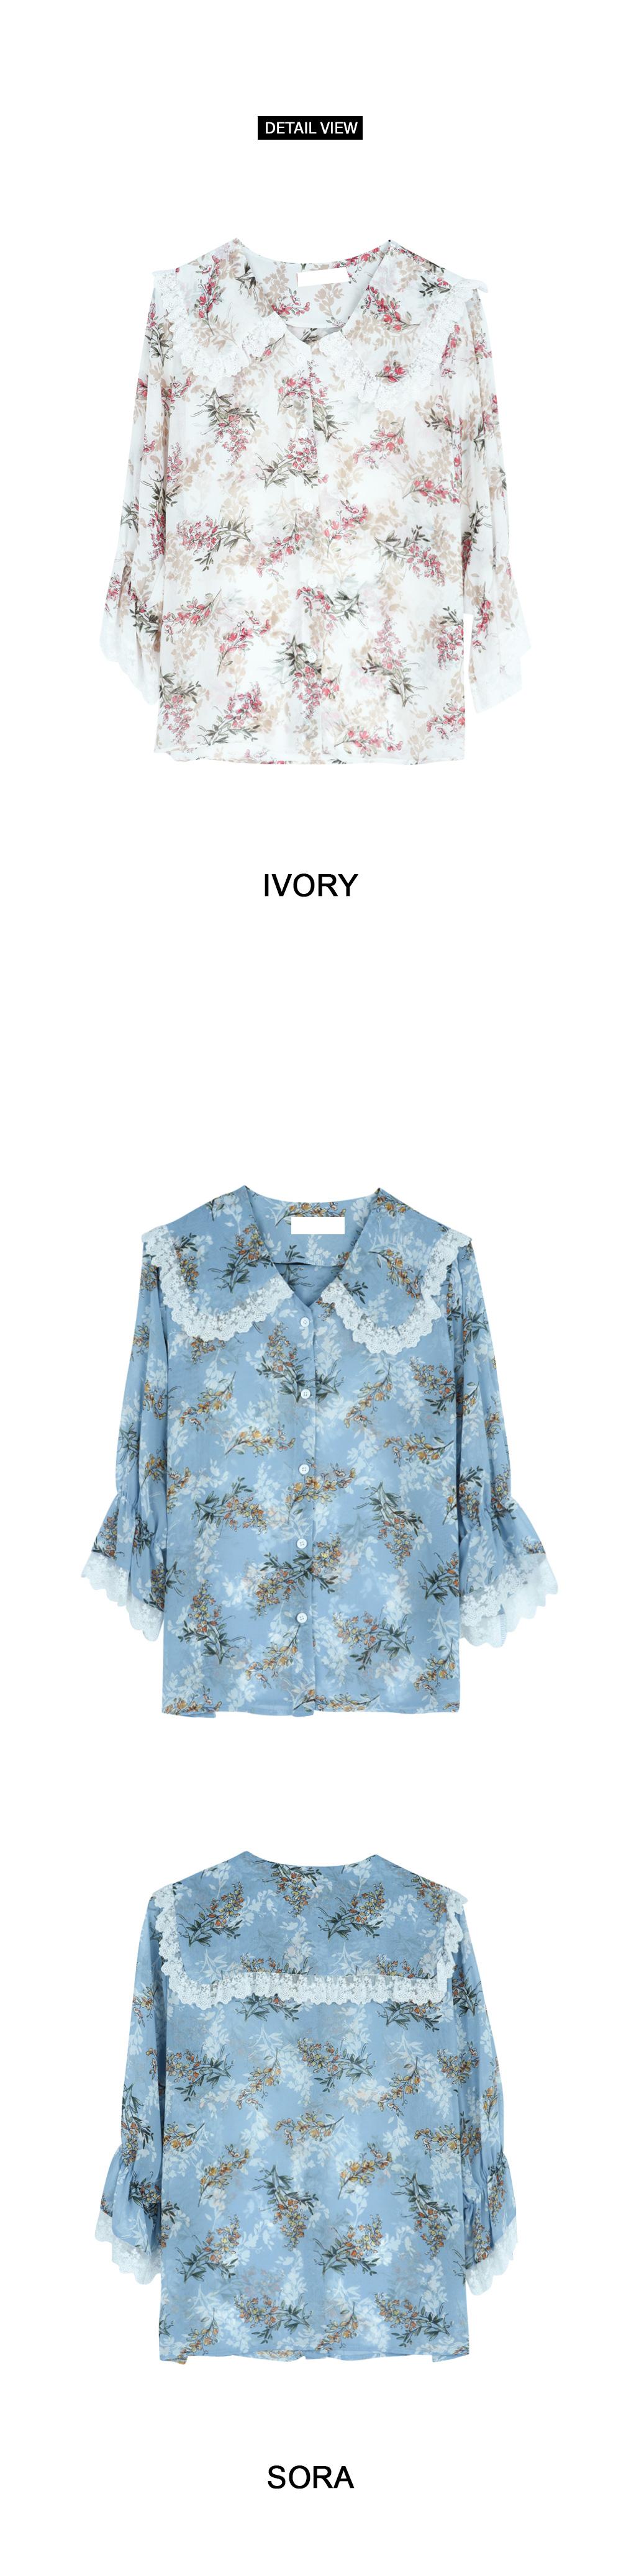 Beauty flower blouse (bl484)